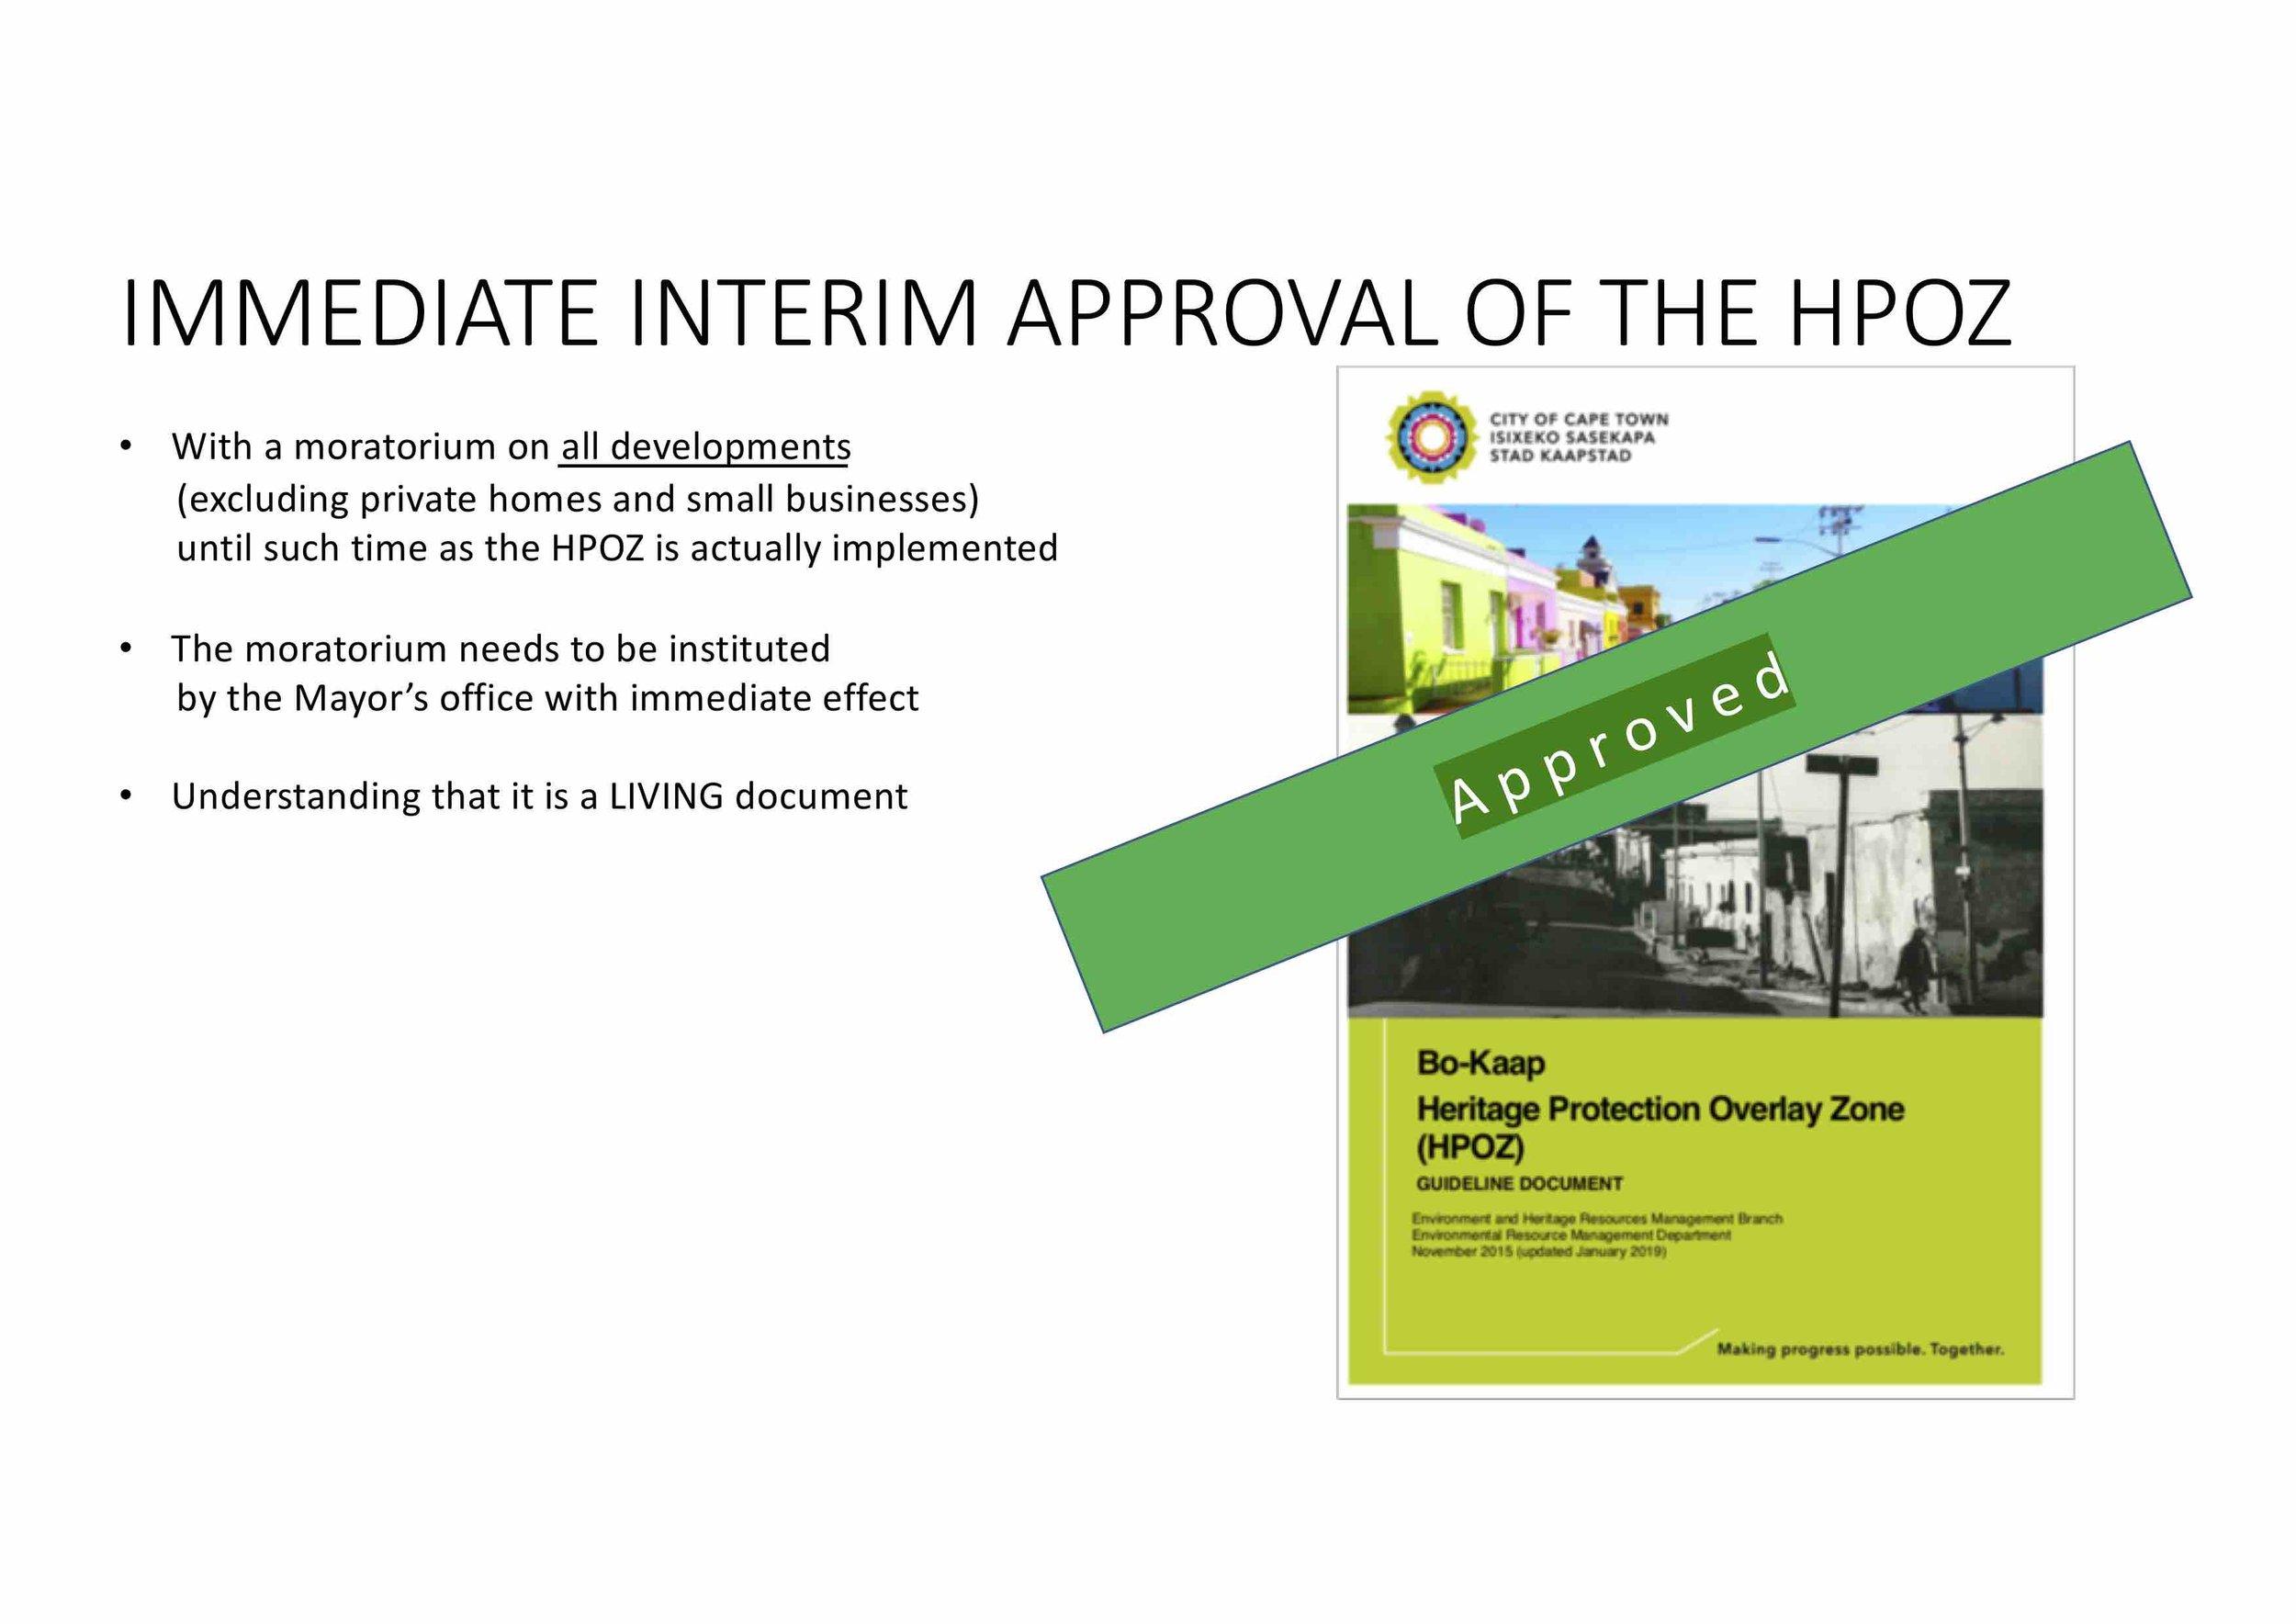 2019 02 09 HPOZ hearings Civic final presentation - 31.jpg